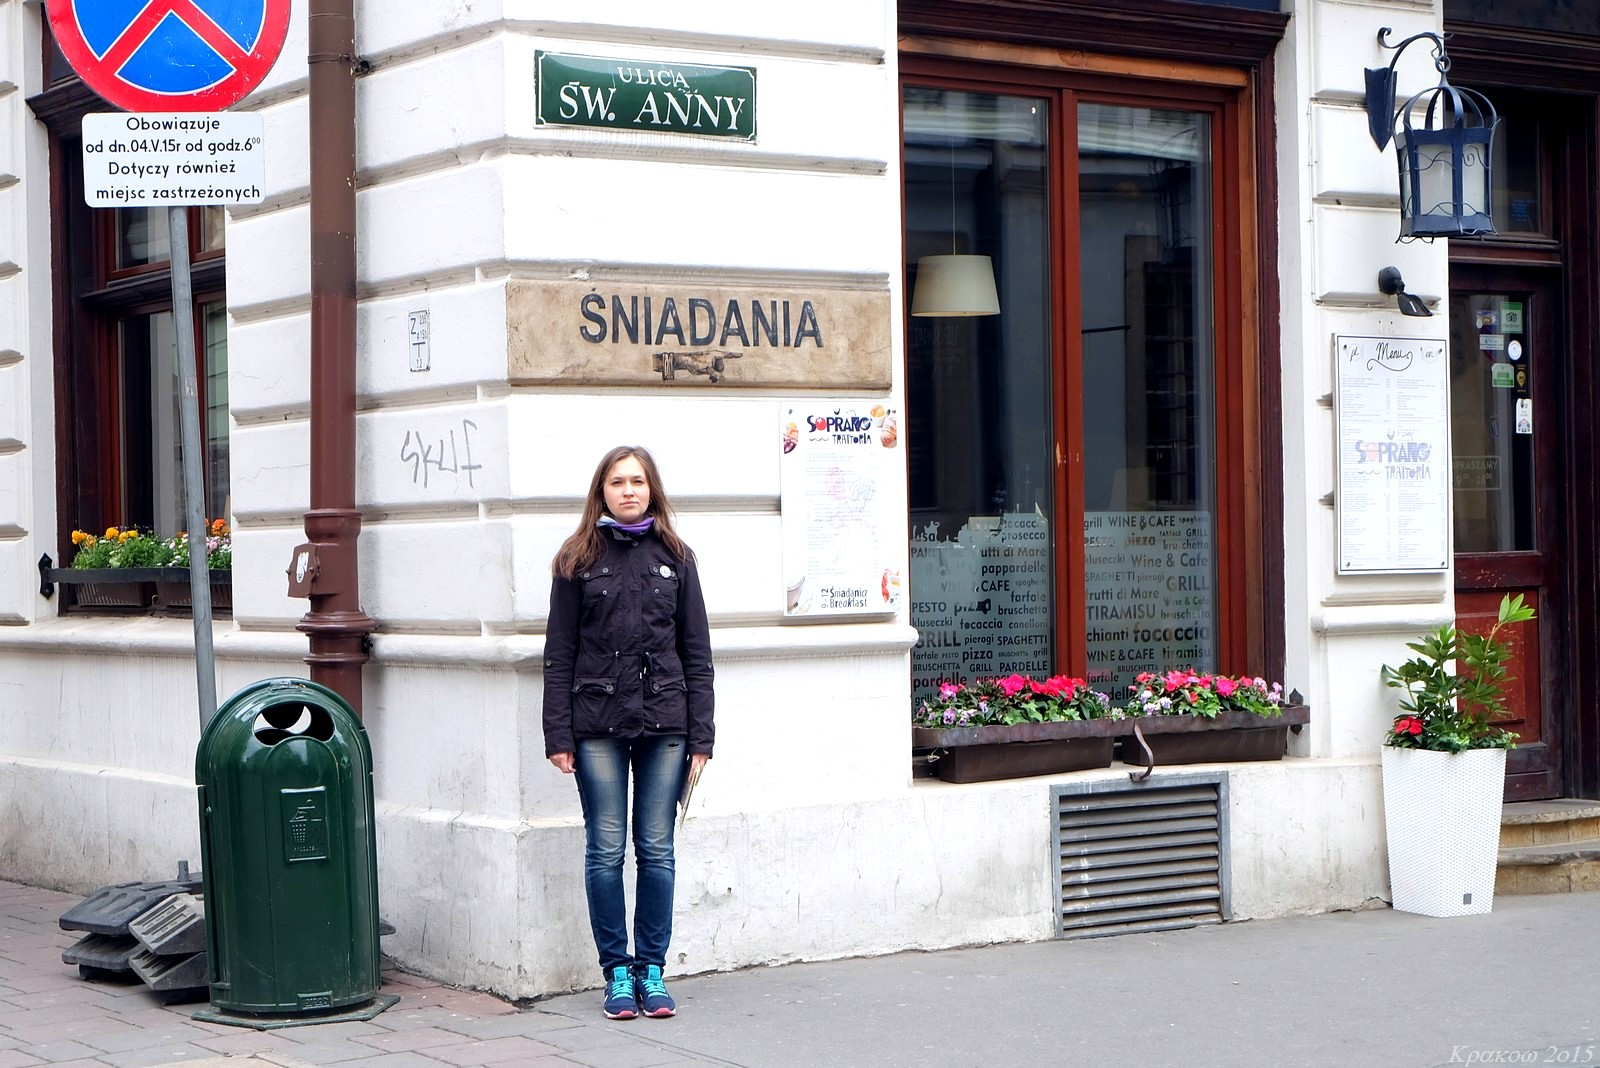 Sw. Anny, Krakow, Poland